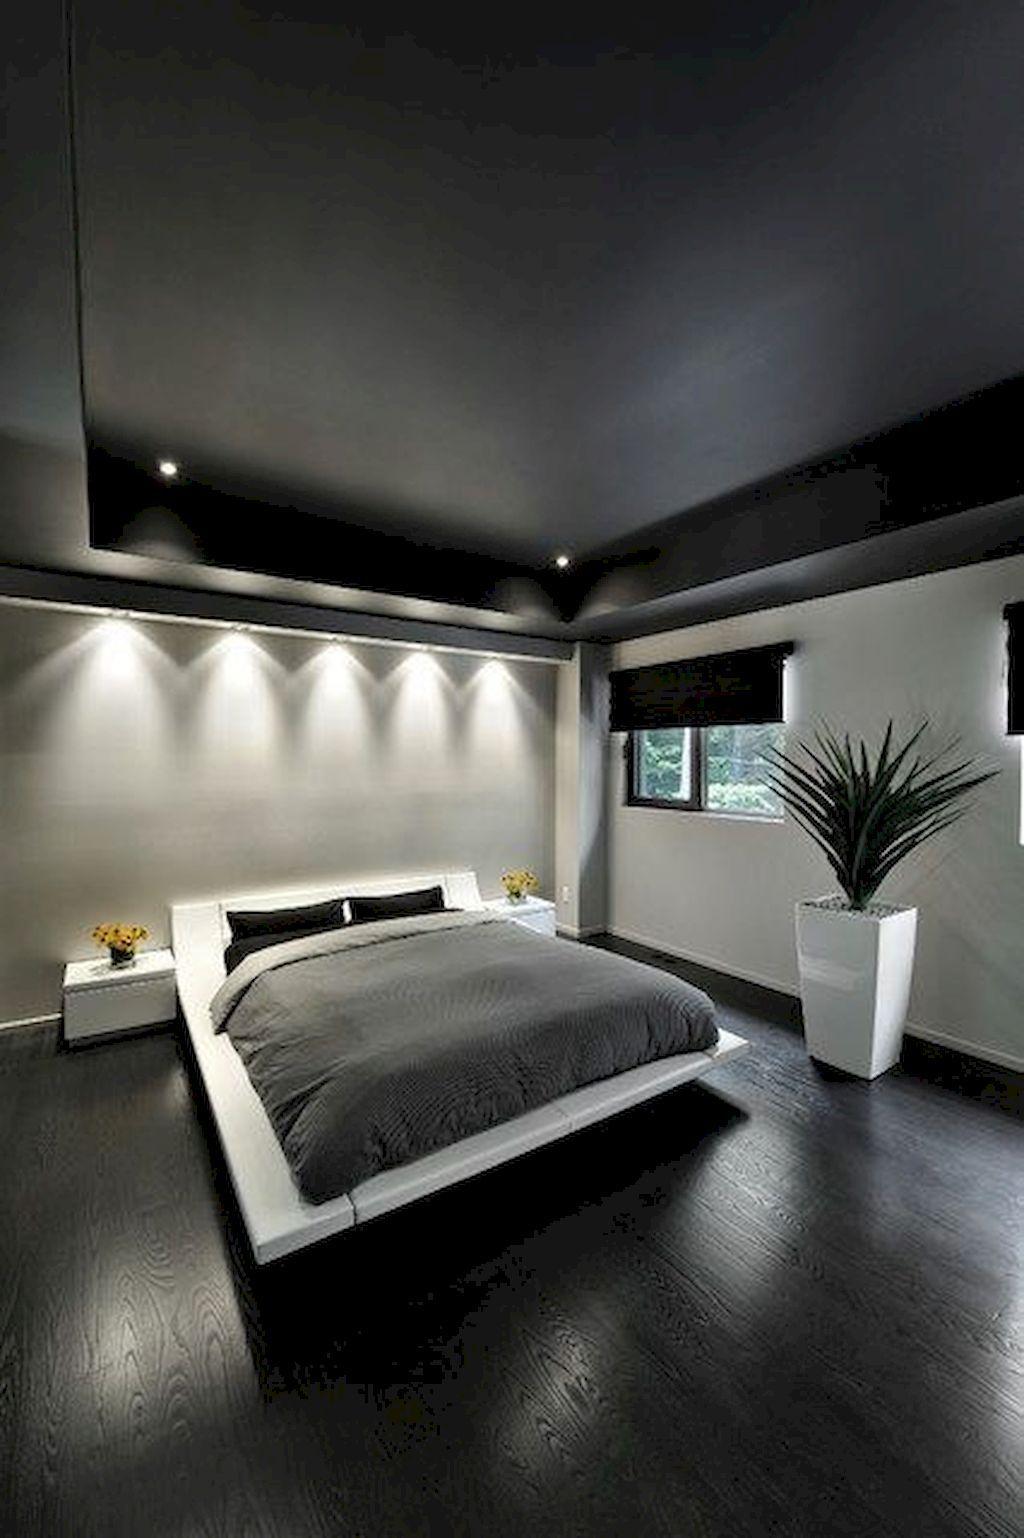 Photo of 90 Minimalist Master Bedroom Design Trends – Structhome.com